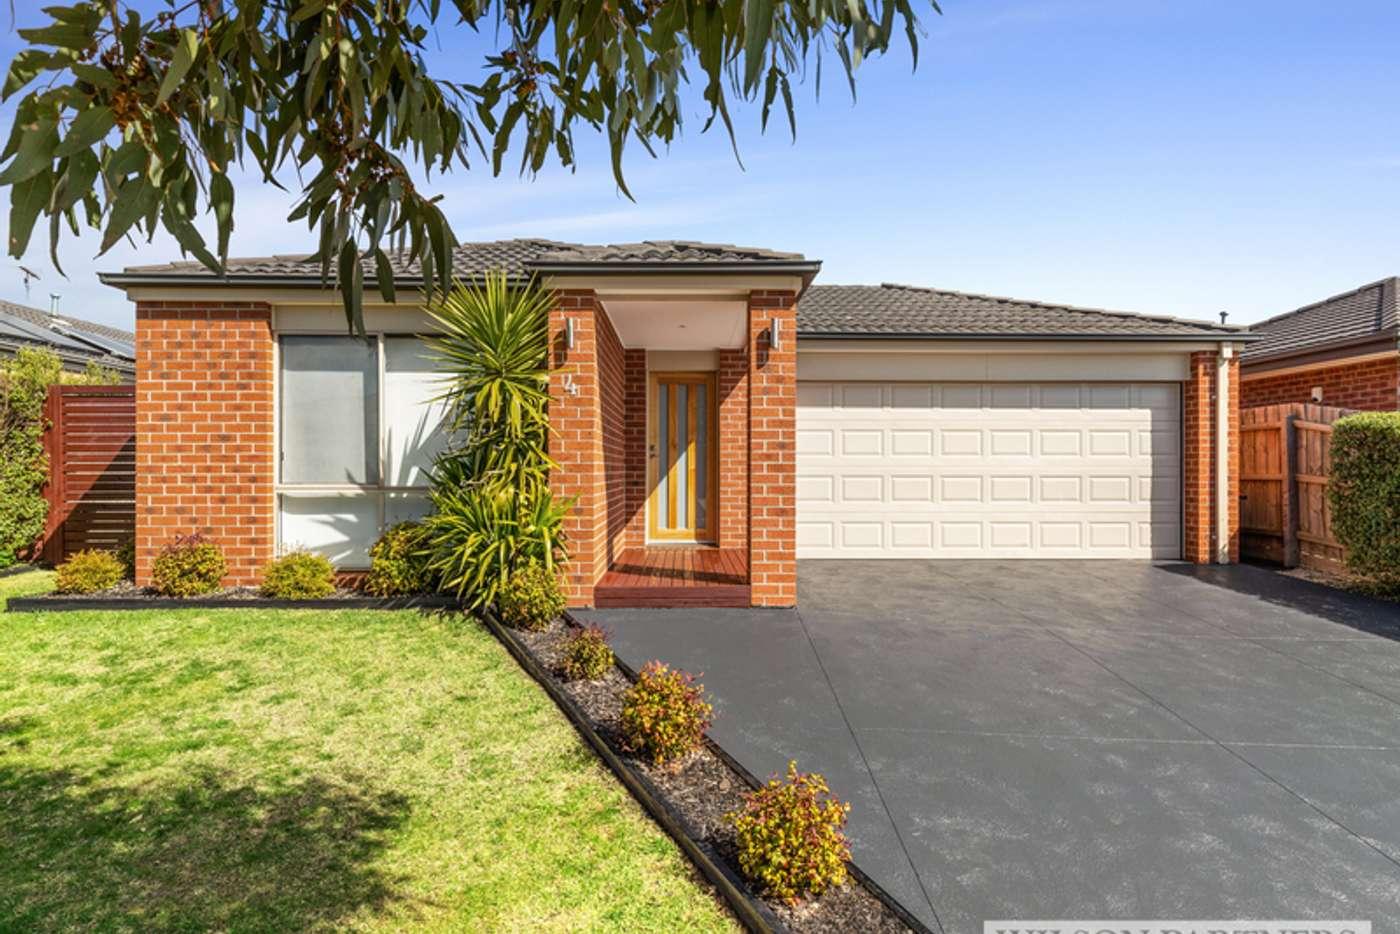 Main view of Homely house listing, 4 Casuarina Street, Kilmore VIC 3764